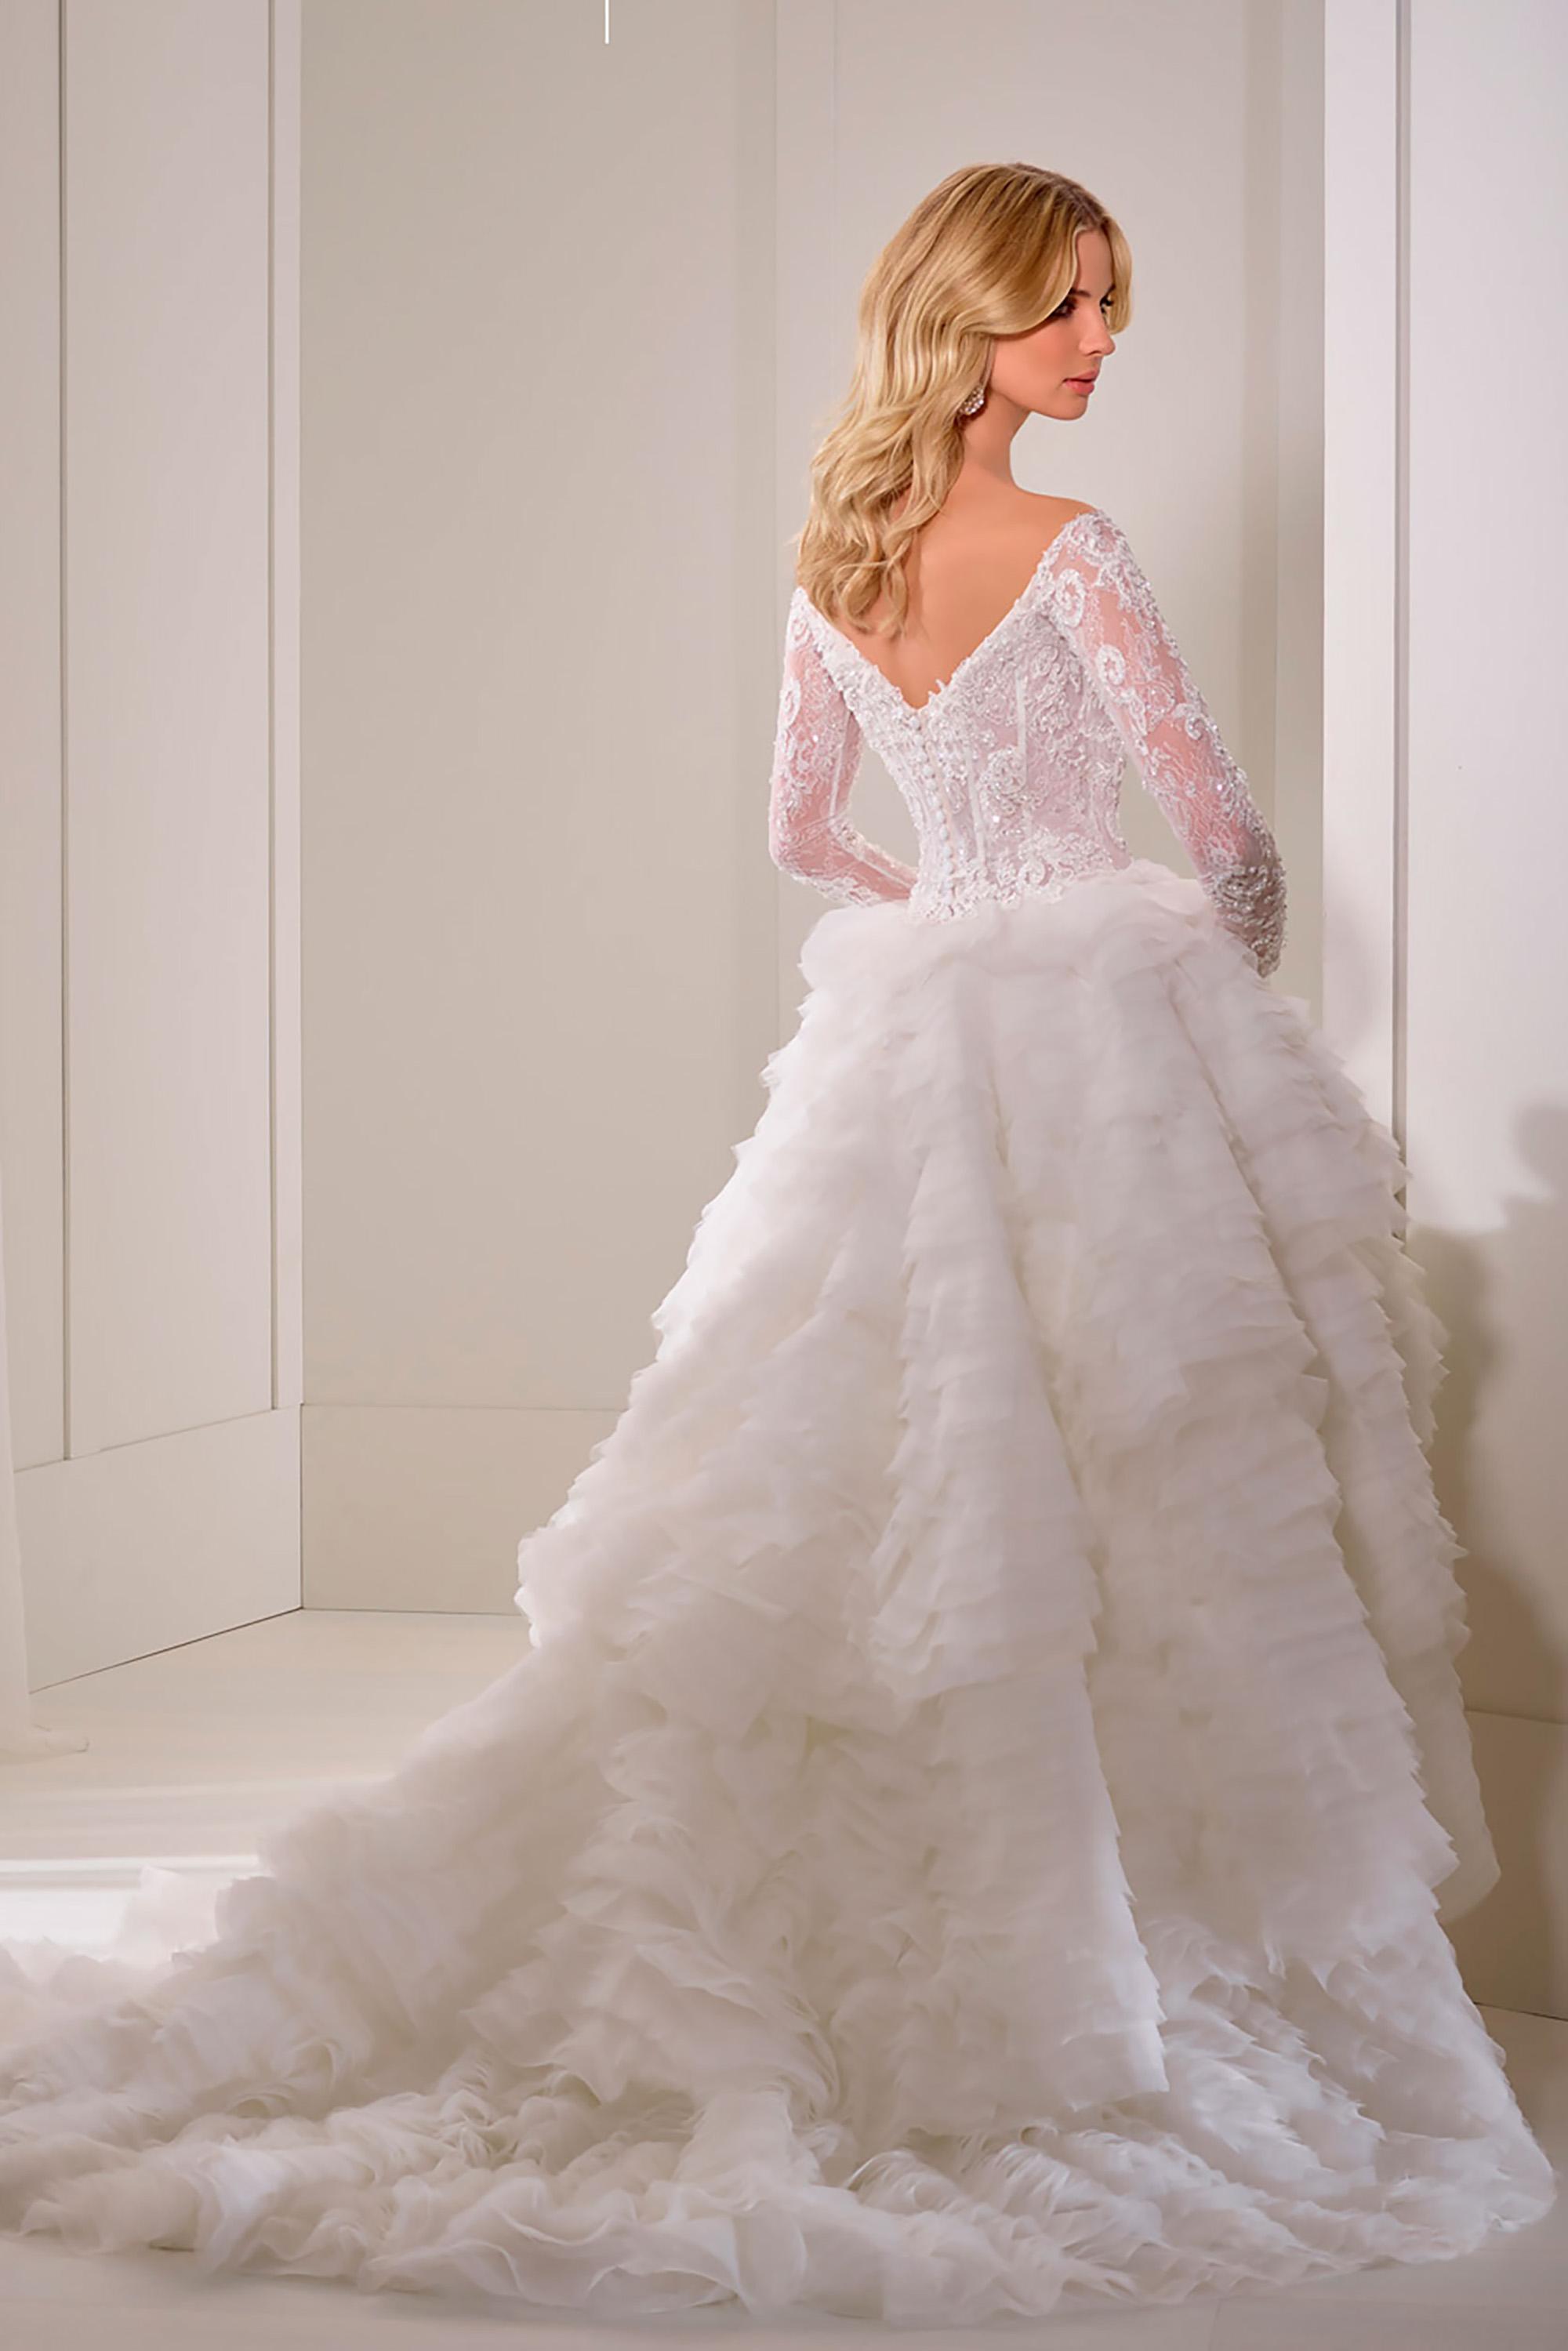 Vestido Lucía Fiesta 2019 mod. 69375 - 7